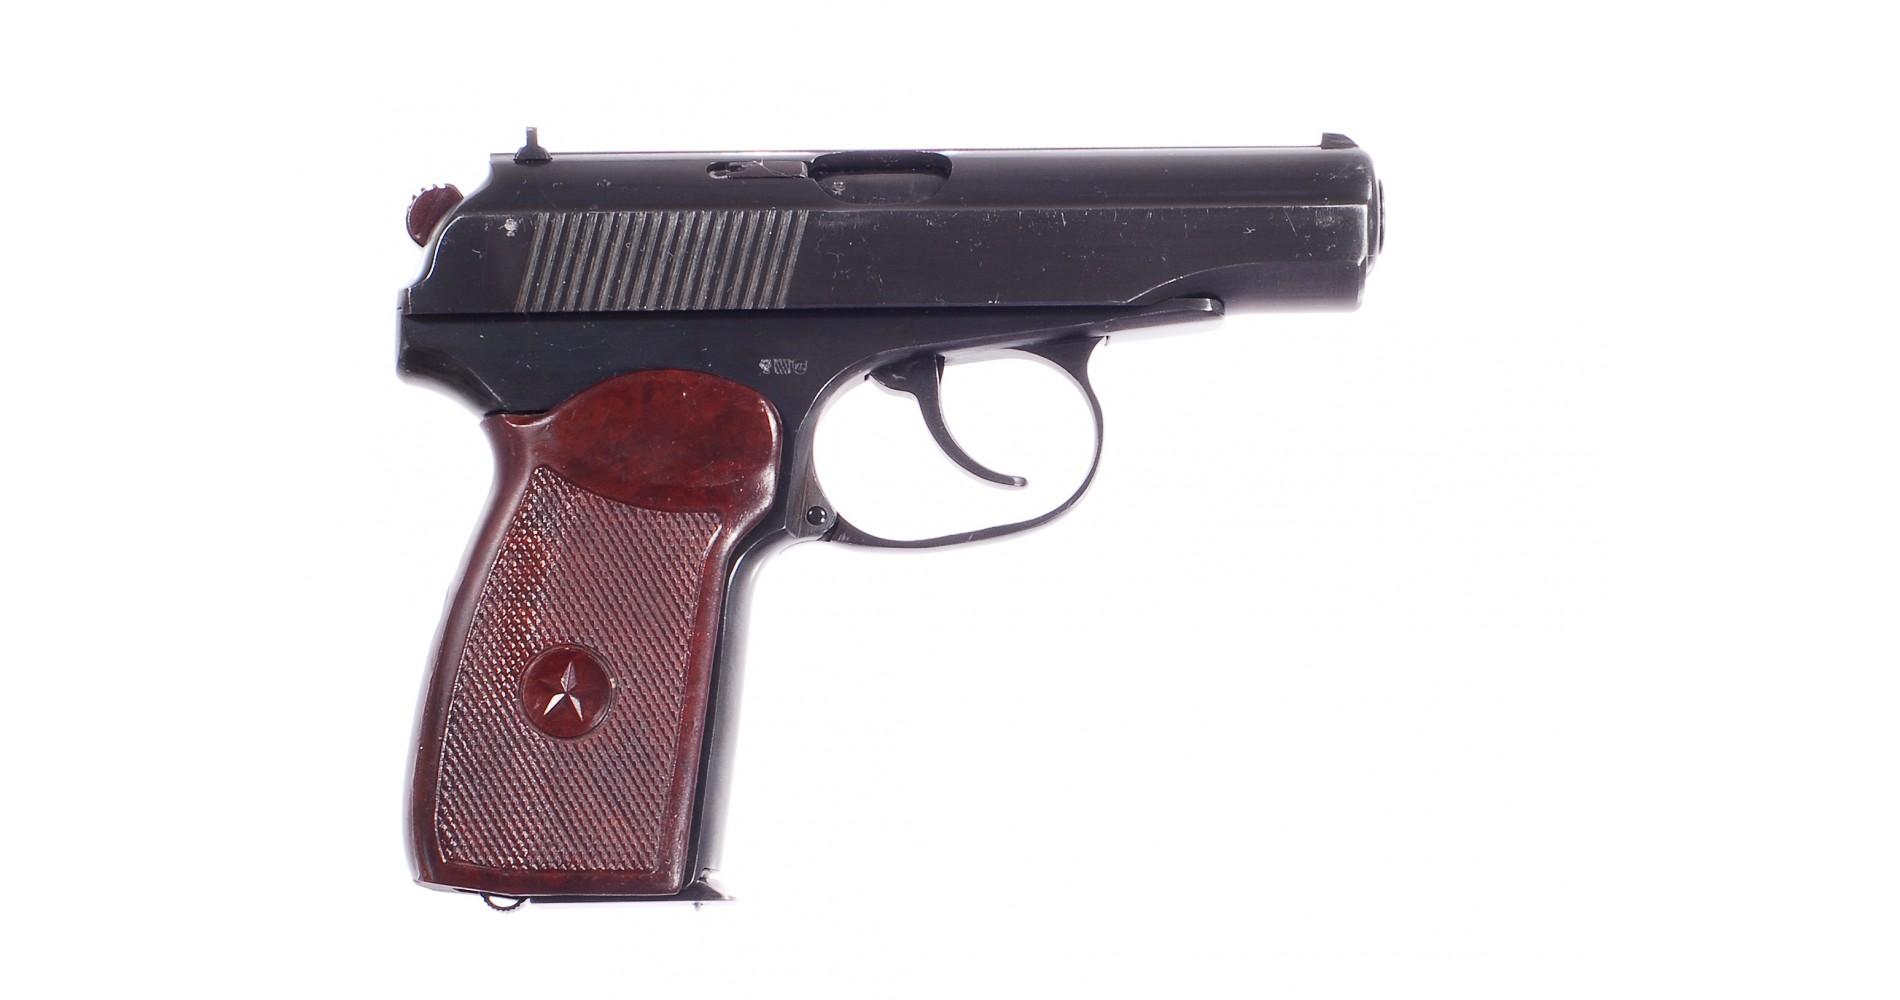 Pistole IJ-70-01 (PM Makarov) 9x18 mm Makarov - č. 3103 ...